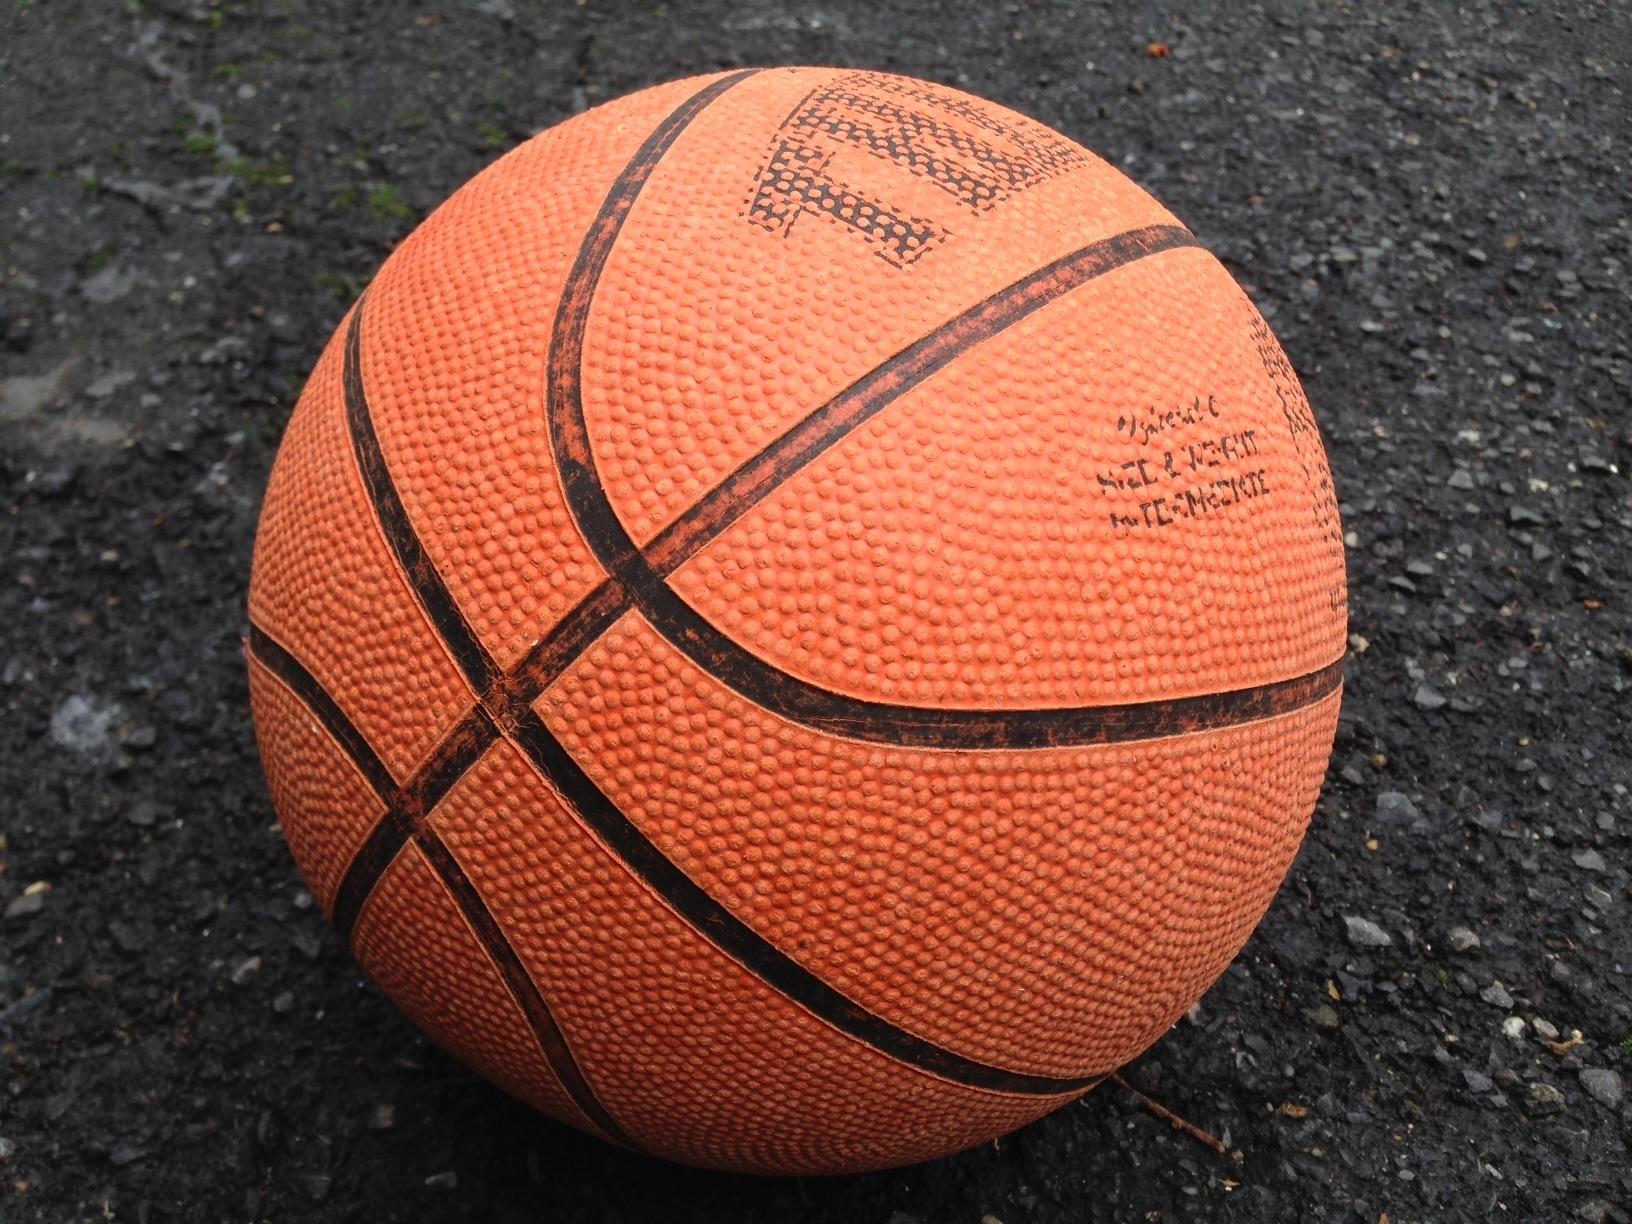 583d36752dcf5f11bc92_basketball.JPG